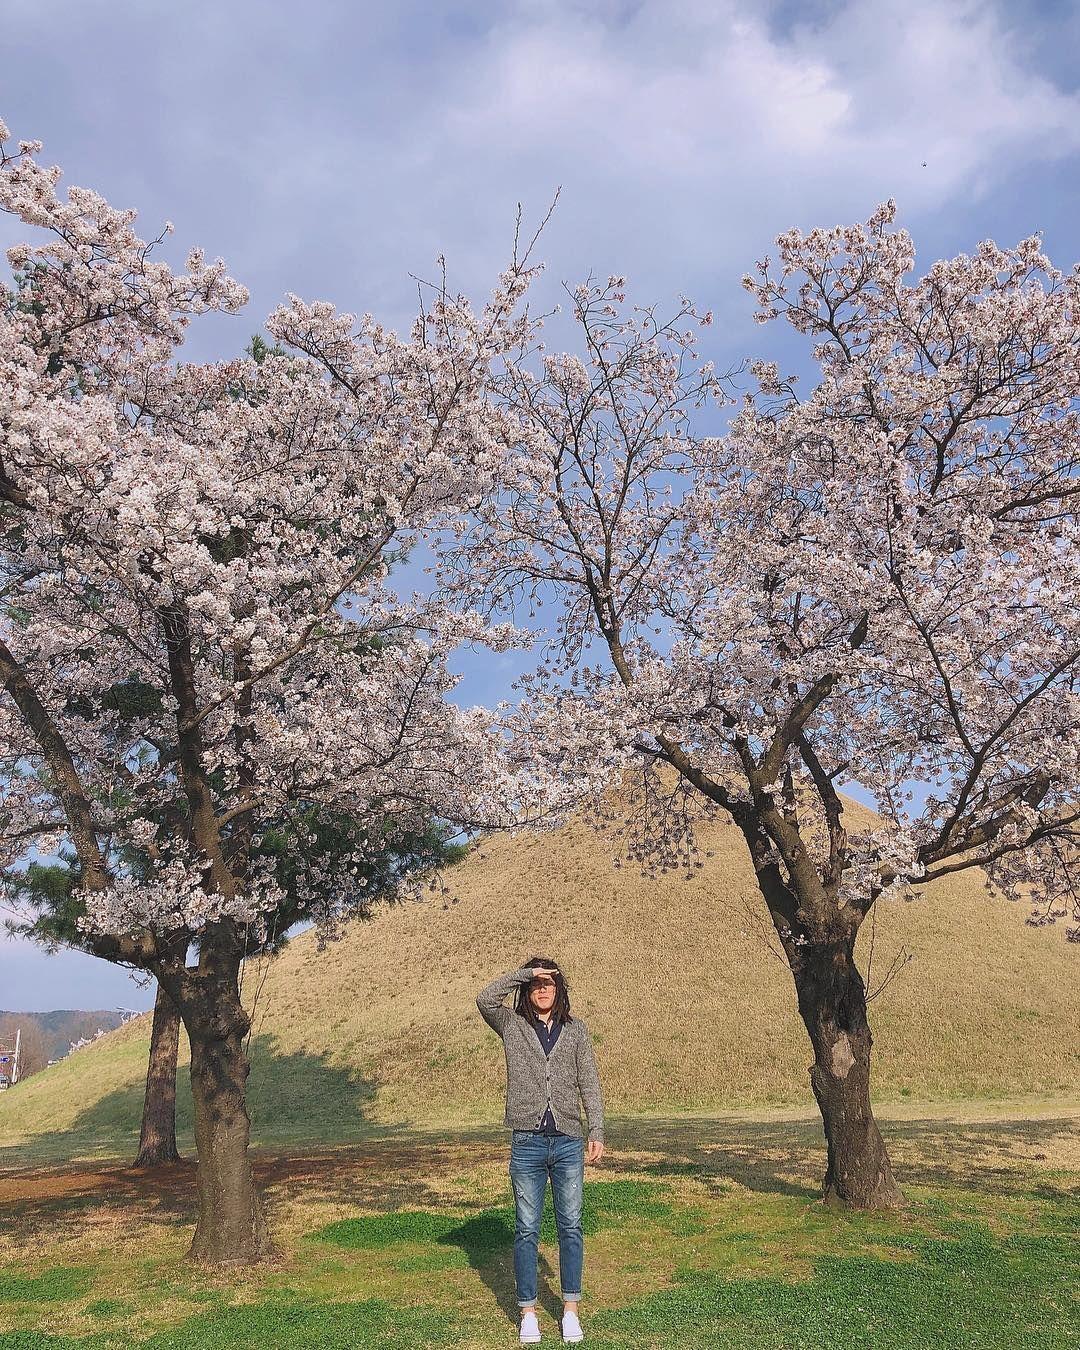 [New] The 10 Best Home Decor (with Pictures) -   . . #경주#봄#봄놀이#벚꽃#벚꽃놀이#데이트#휴무#꿀휴무#대릉원#비타민식#데일리#비타민식#cherryblossom#dayoff#holiday#vitaminsik#daily#l4l#f4f#spring